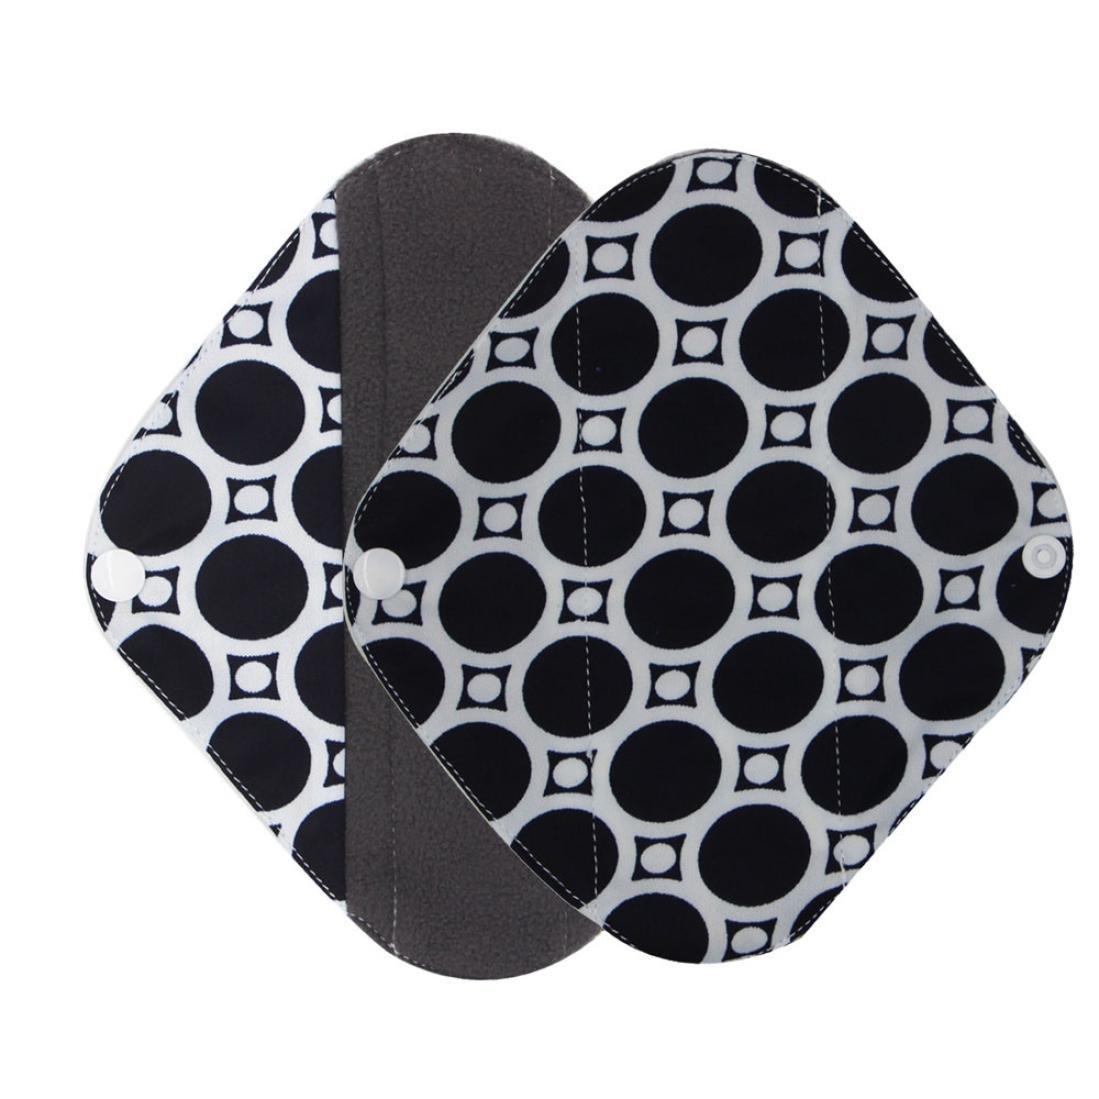 WYTong Washable Heavy Flow Charcoal Bamboo Mama Cloth/ Menstrual Choth Pads/ Reusable Sanitary Pads (Black, S)